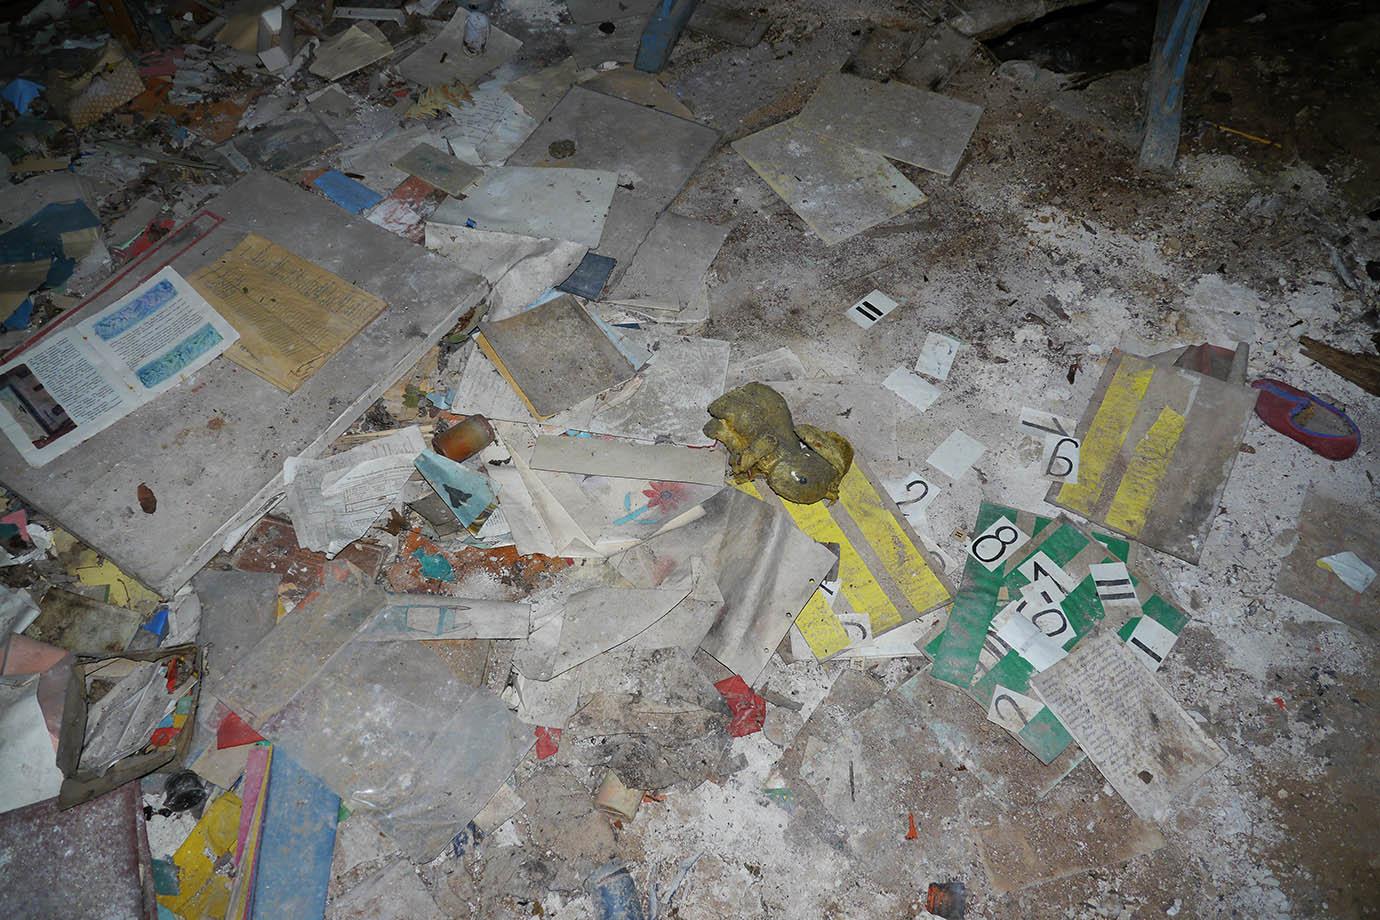 chernobyl-disaster22